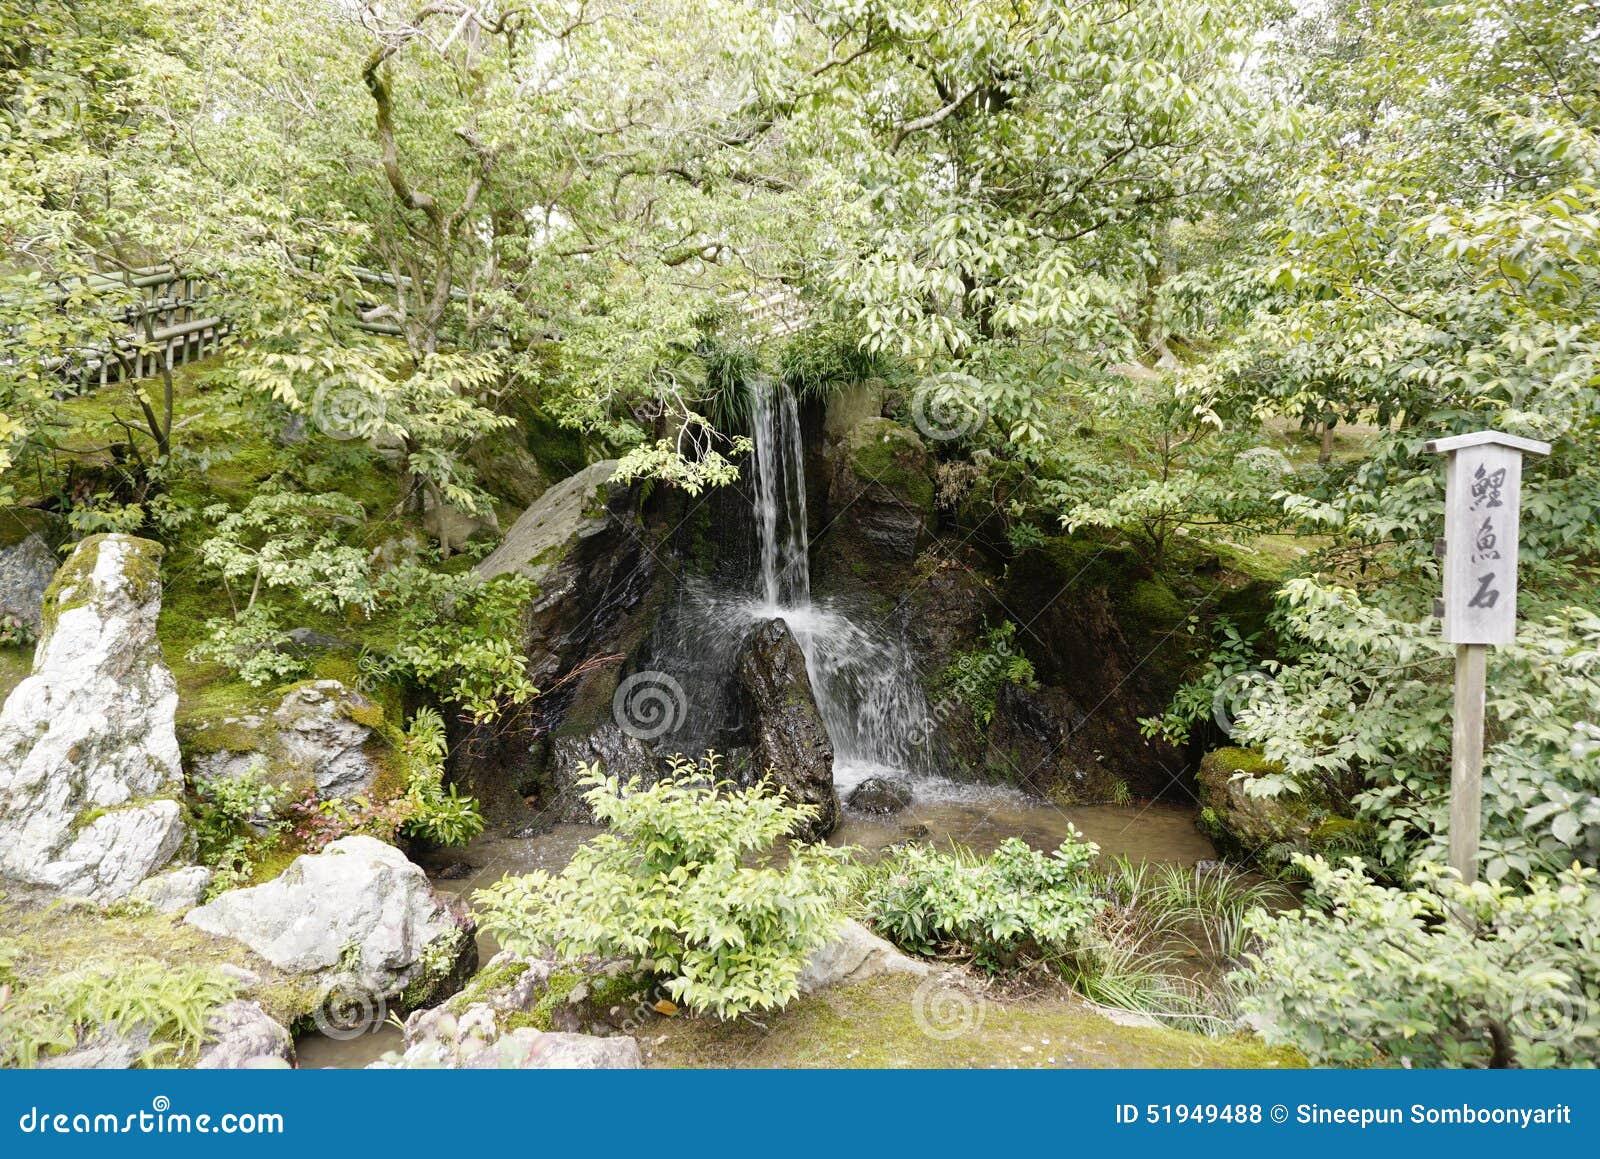 Jardin Mineral Zen Photo pequeña cascada natural en jardín del zen foto de archivo